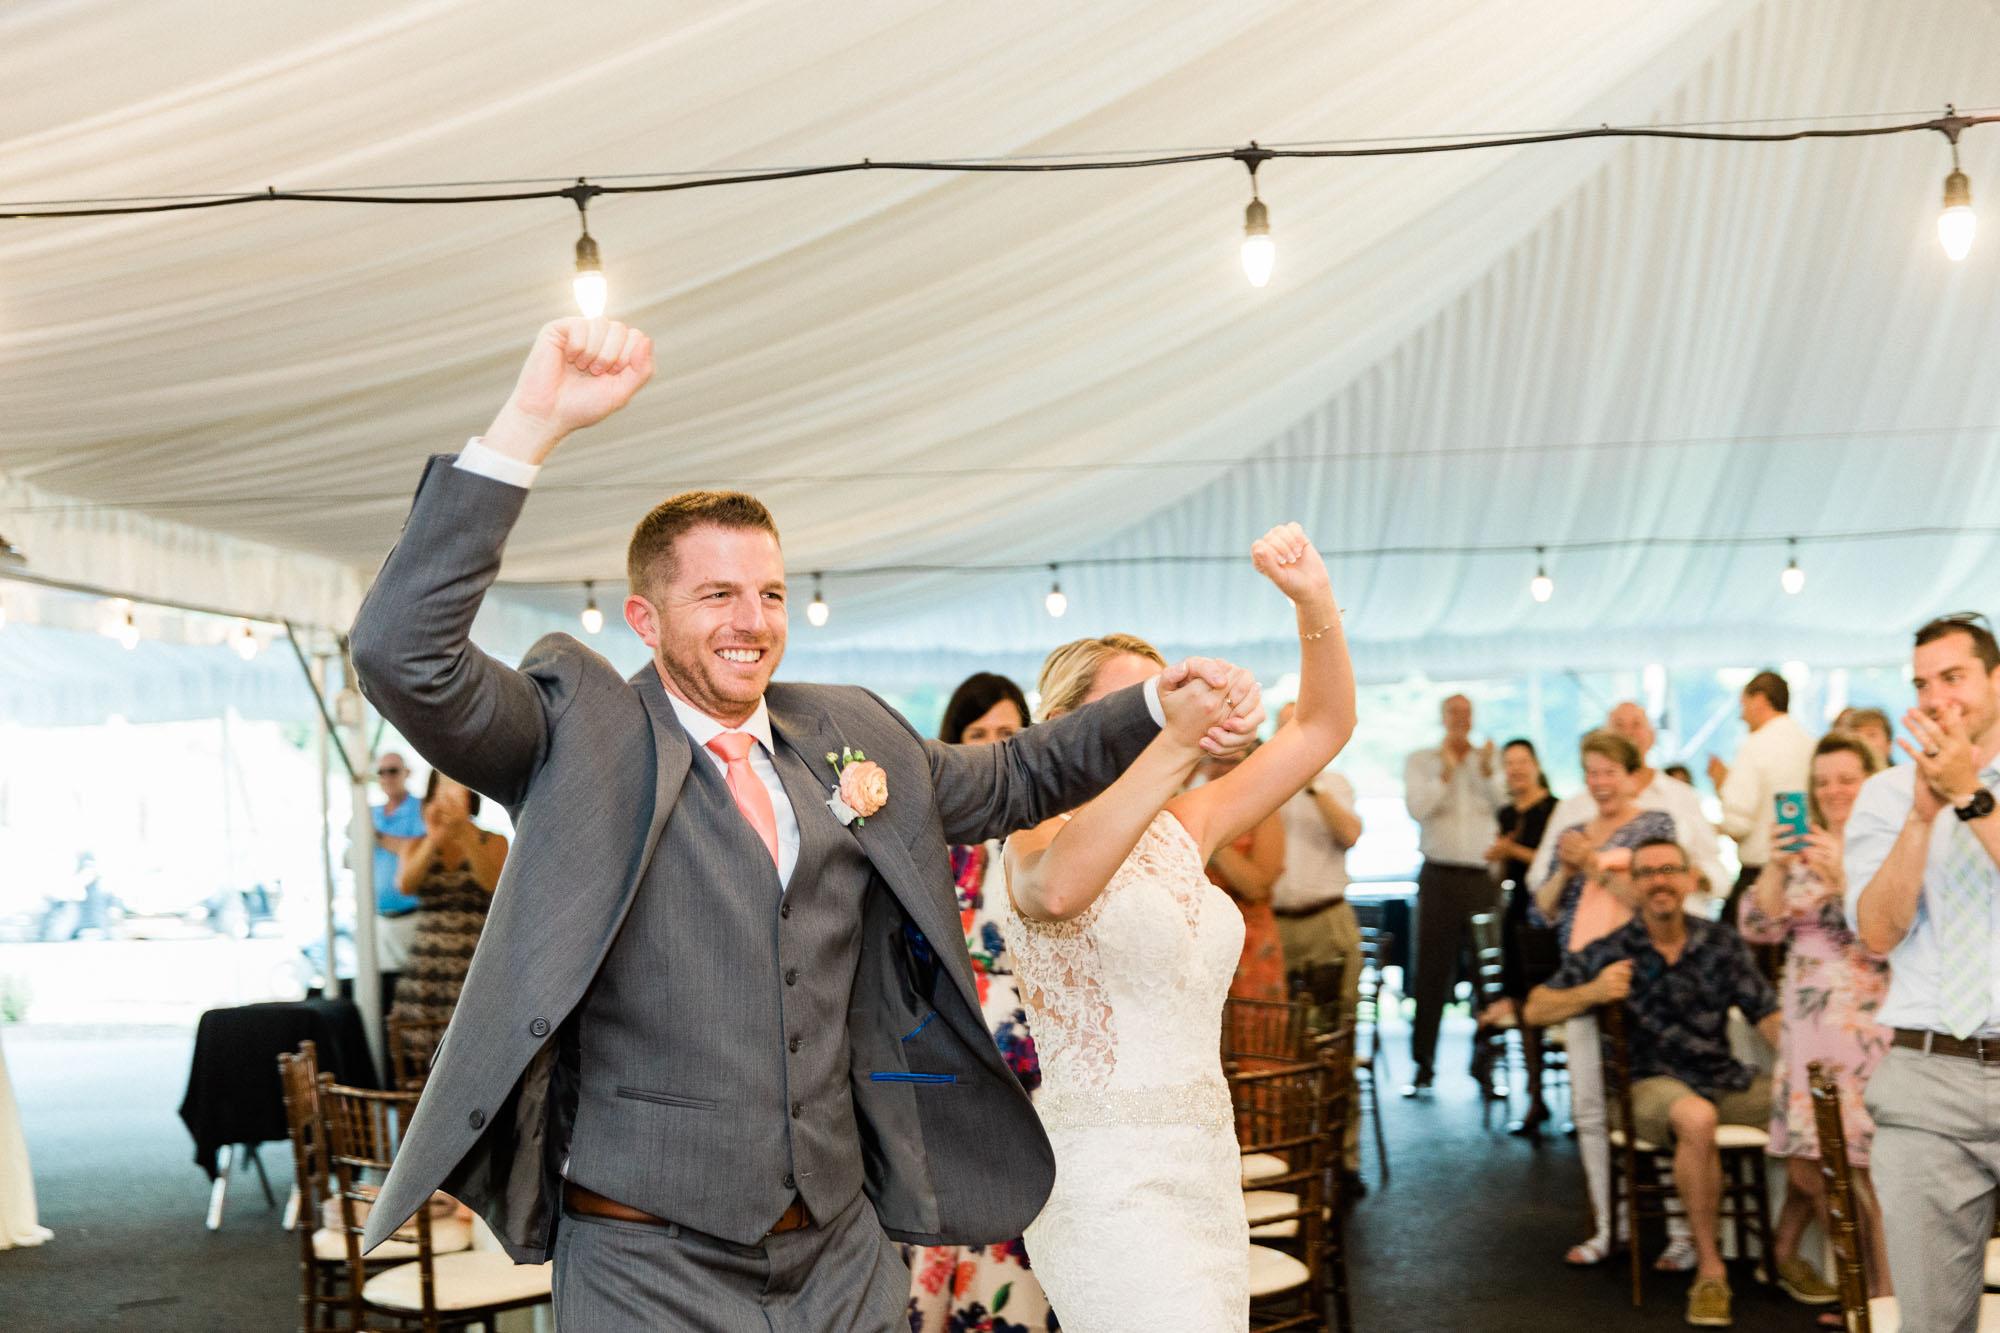 Allenberry-resort-historic-pennsylvania-wedding-10370.jpg